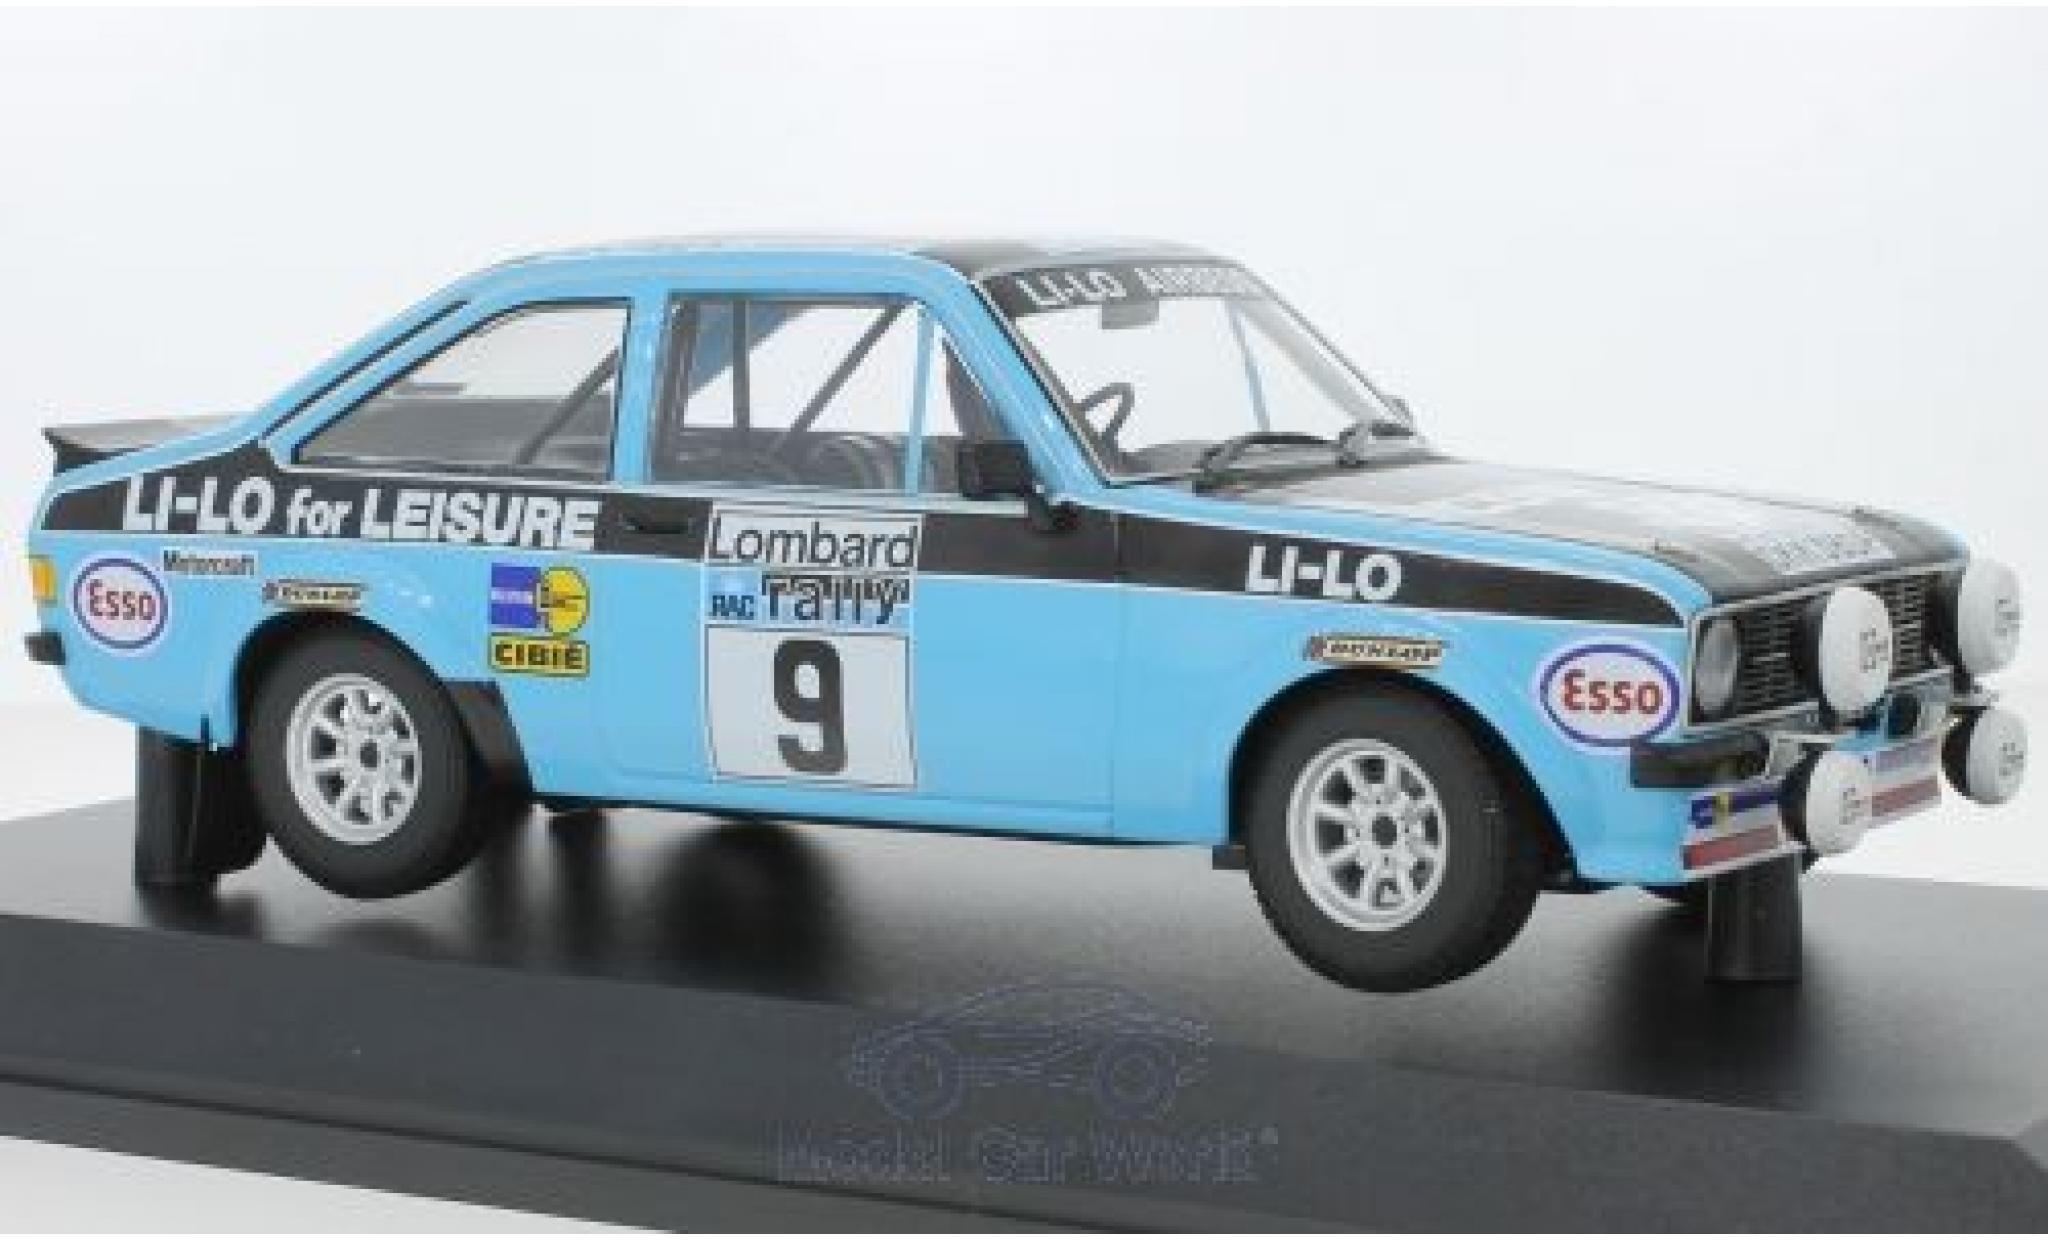 Ford Escort 1/18 Minichamps RS 1800 No.9 Li-Lo Equipe Esso Rallye RAC Lombard 1978 R.Clark/N.Wilson